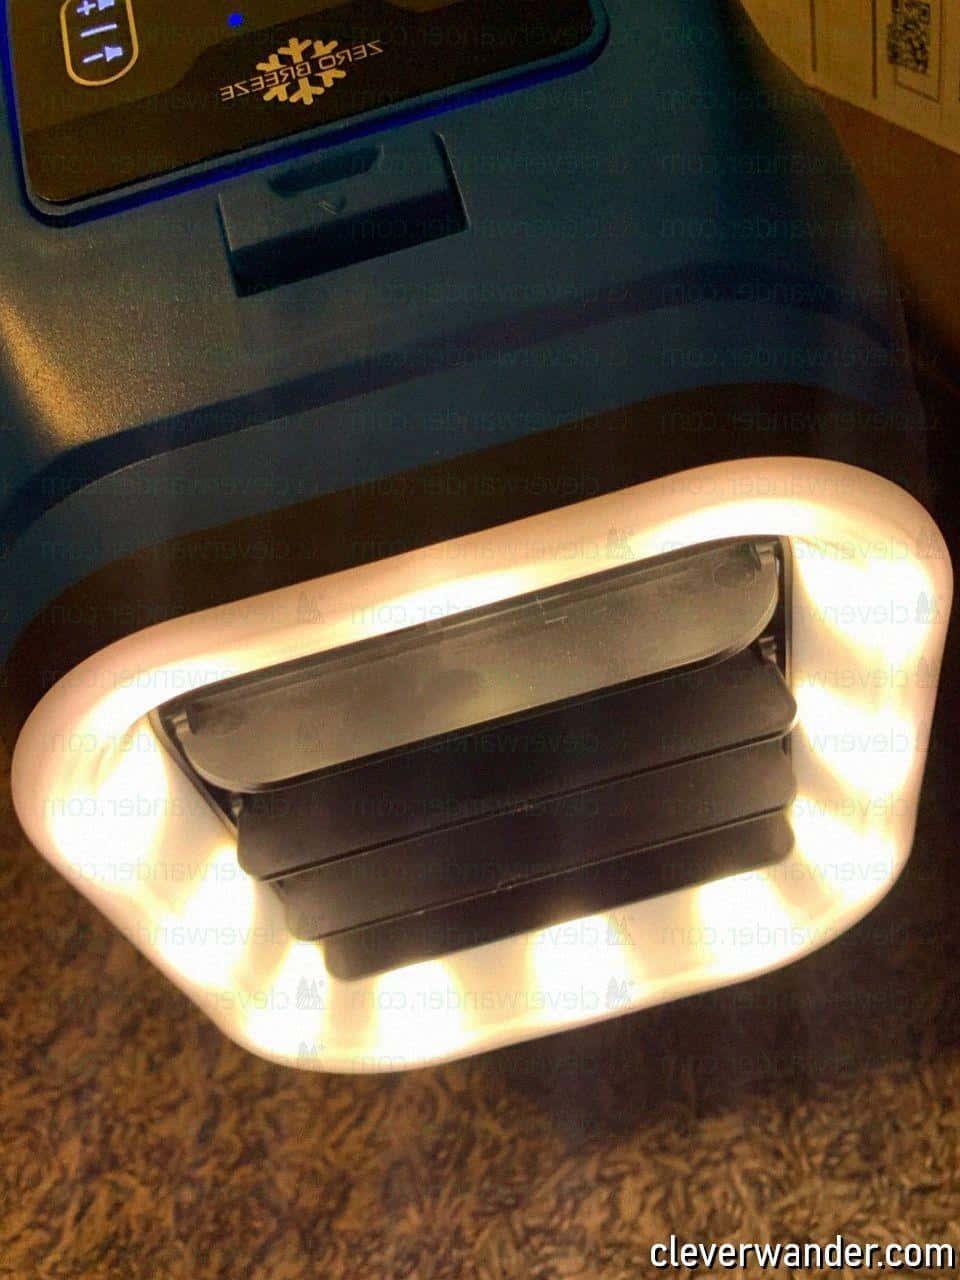 Zero Breeze Portable Air Conditioner - image review 1